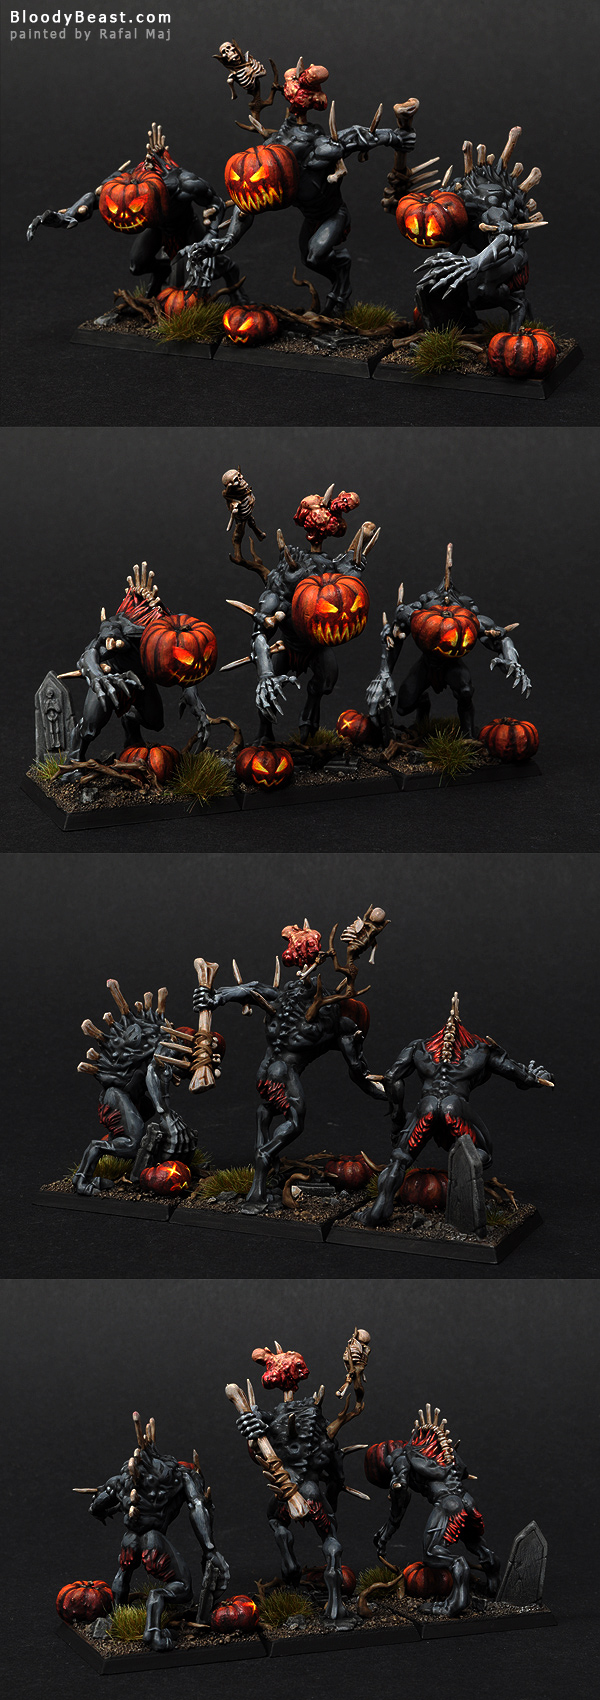 Halloween Pumpkin Head Crypt Horrors painted by Rafal Maj (BloodyBeast.com)